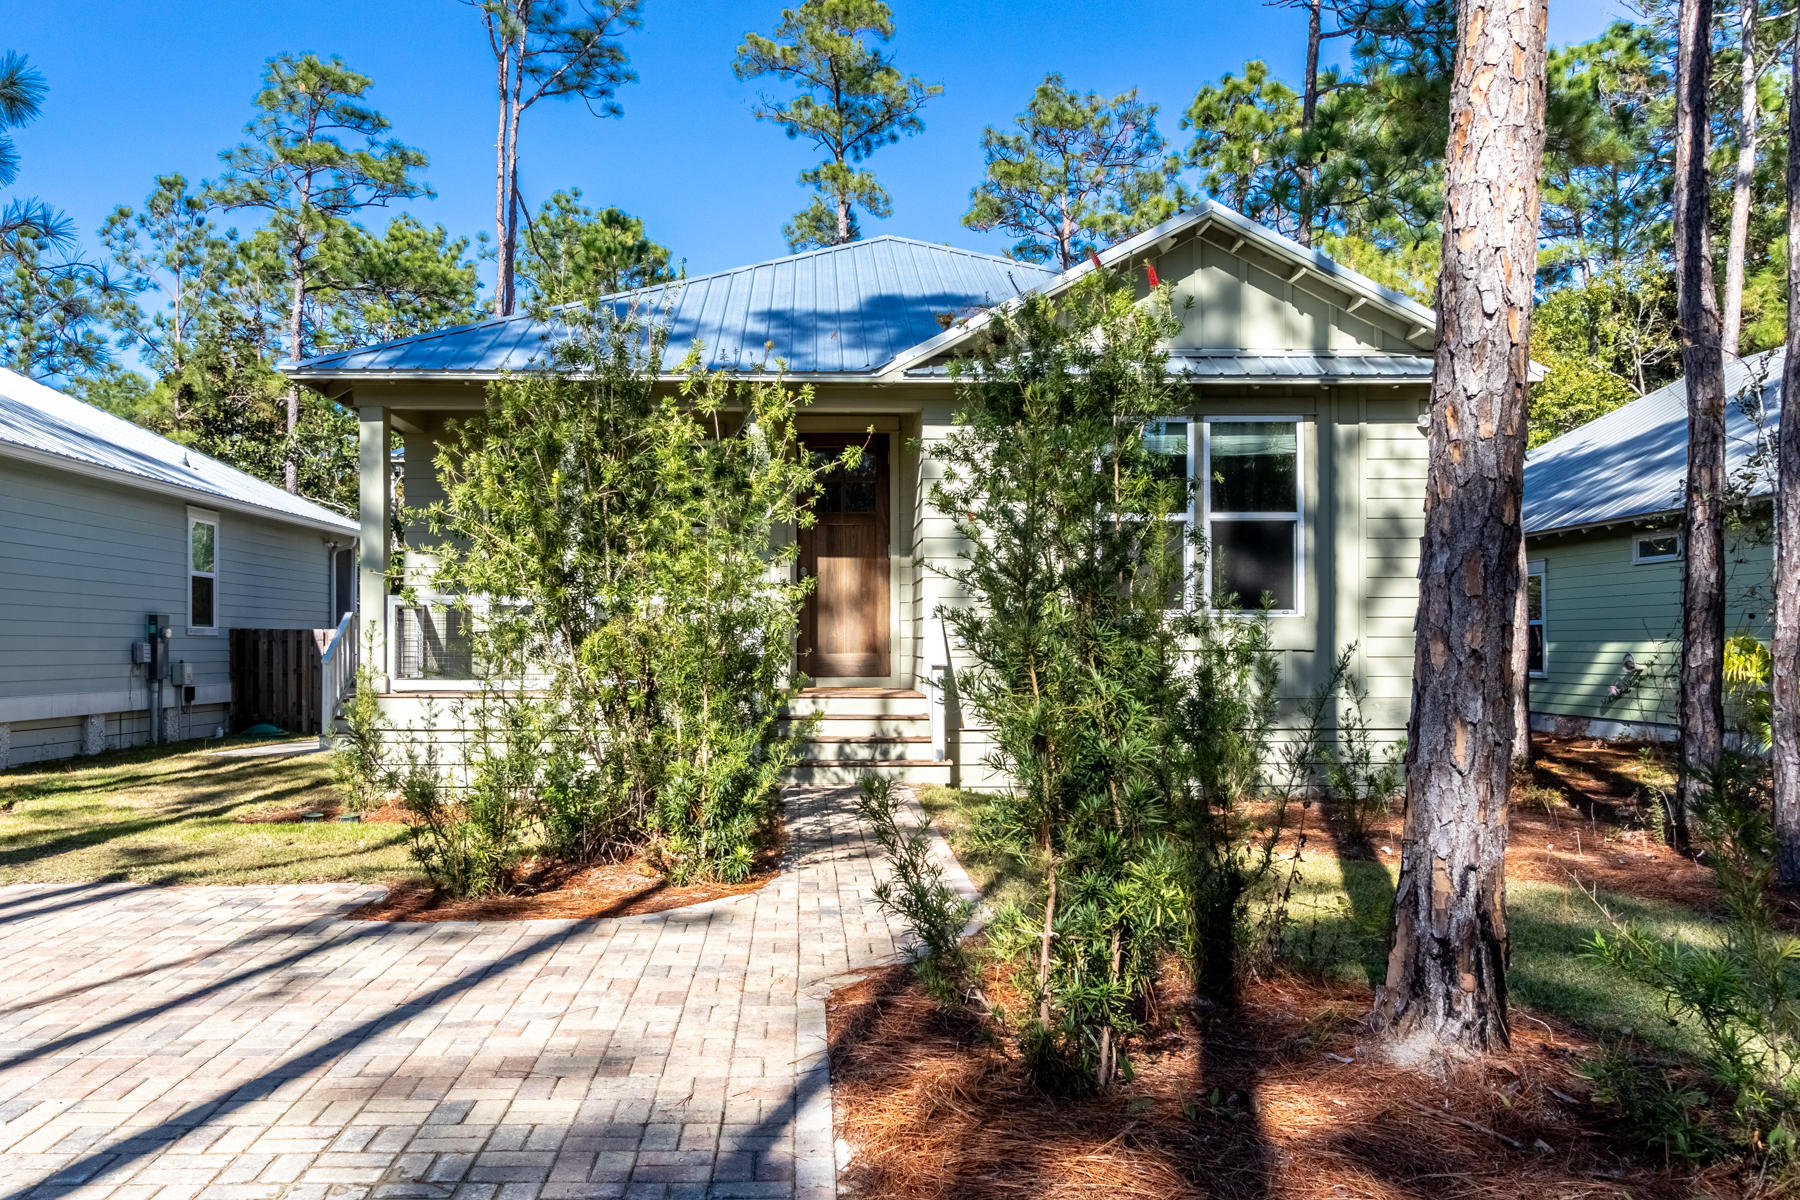 Photo of home for sale at 52 Georgie, Santa Rosa Beach FL